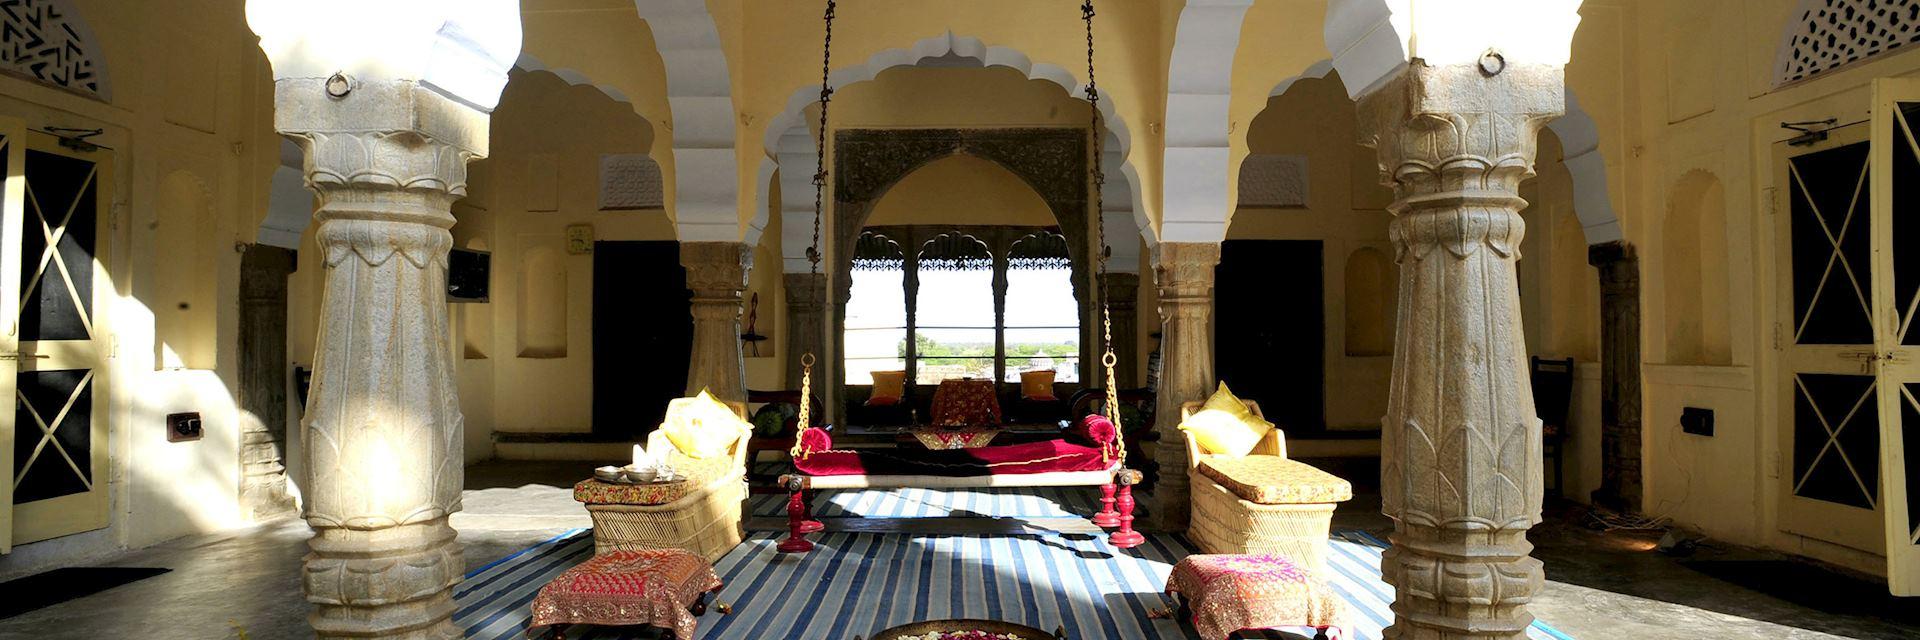 Fort Barli, India